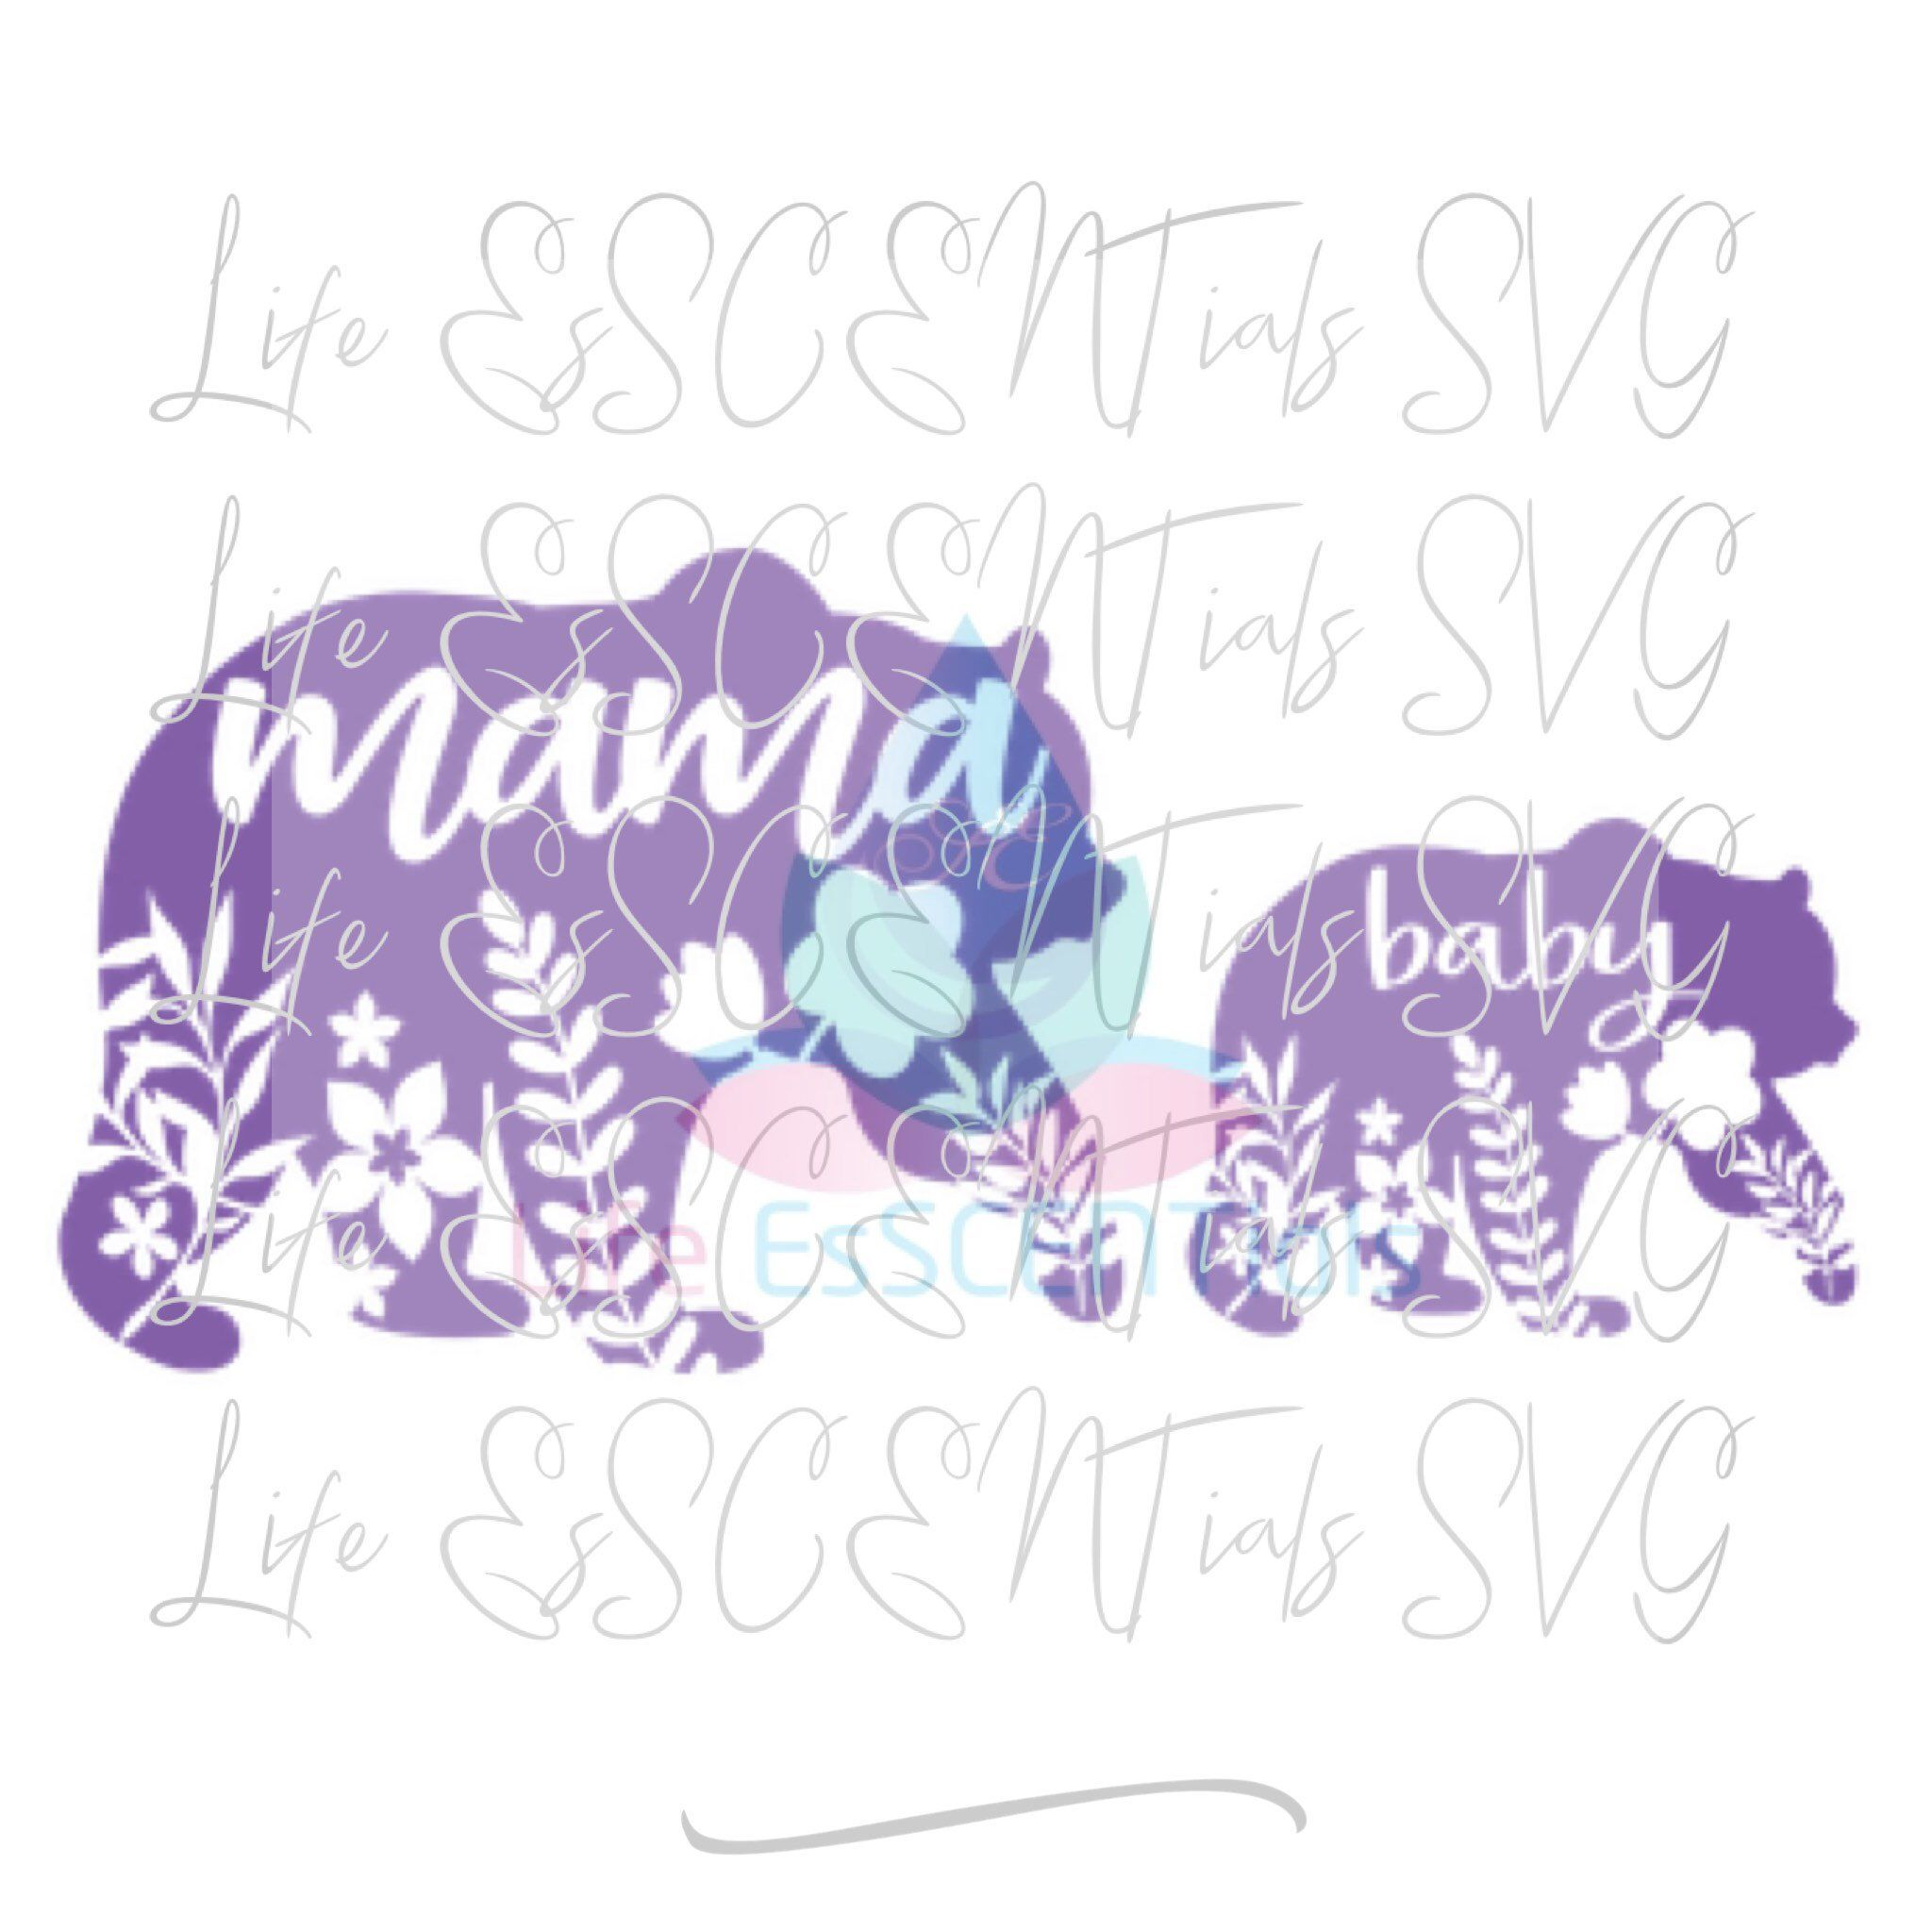 Art Unlimited Sportswear: Floral Mama & Cub Bear Floral SVG DIGITAL Only Cut File